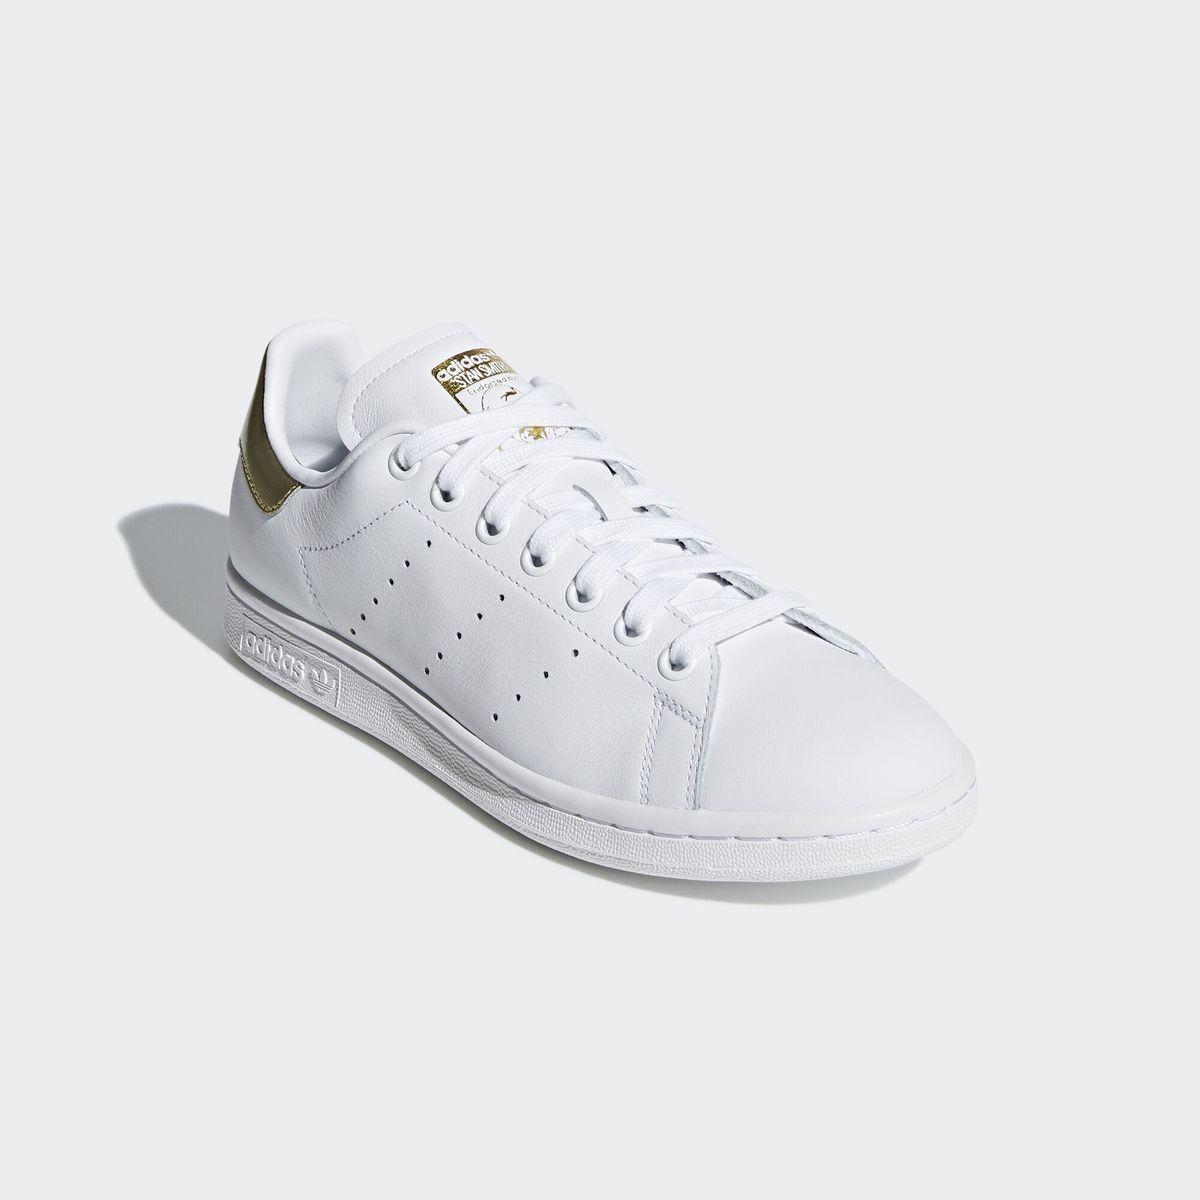 magasin en ligne c95c1 1ac09 Baskets Stan Smith - Taille : 37 1/3;40;36;39 1/3;44;36 2/3 ...